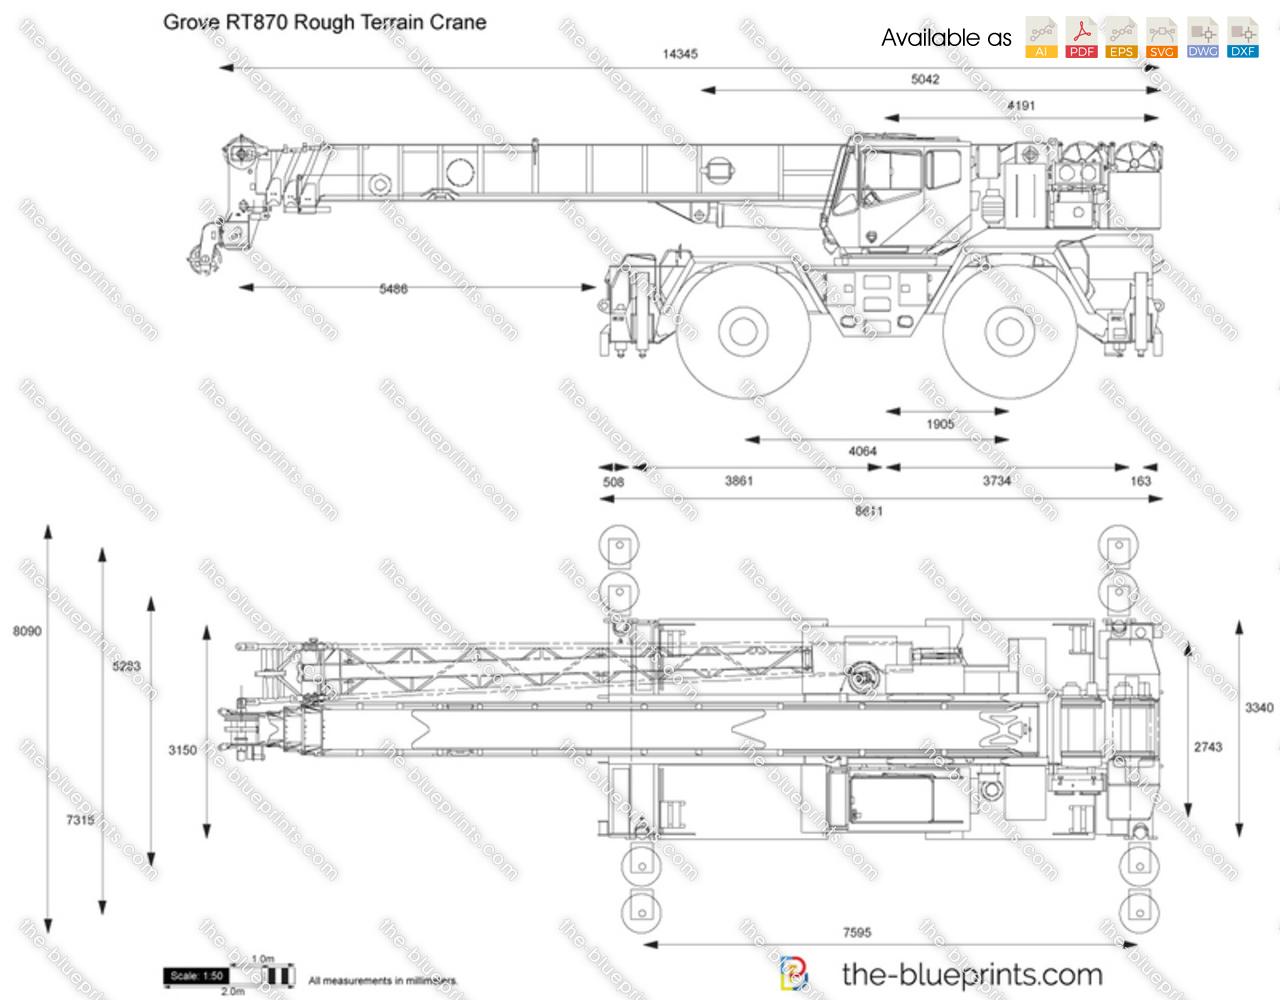 Grove RT870 Rough Terrain Crane